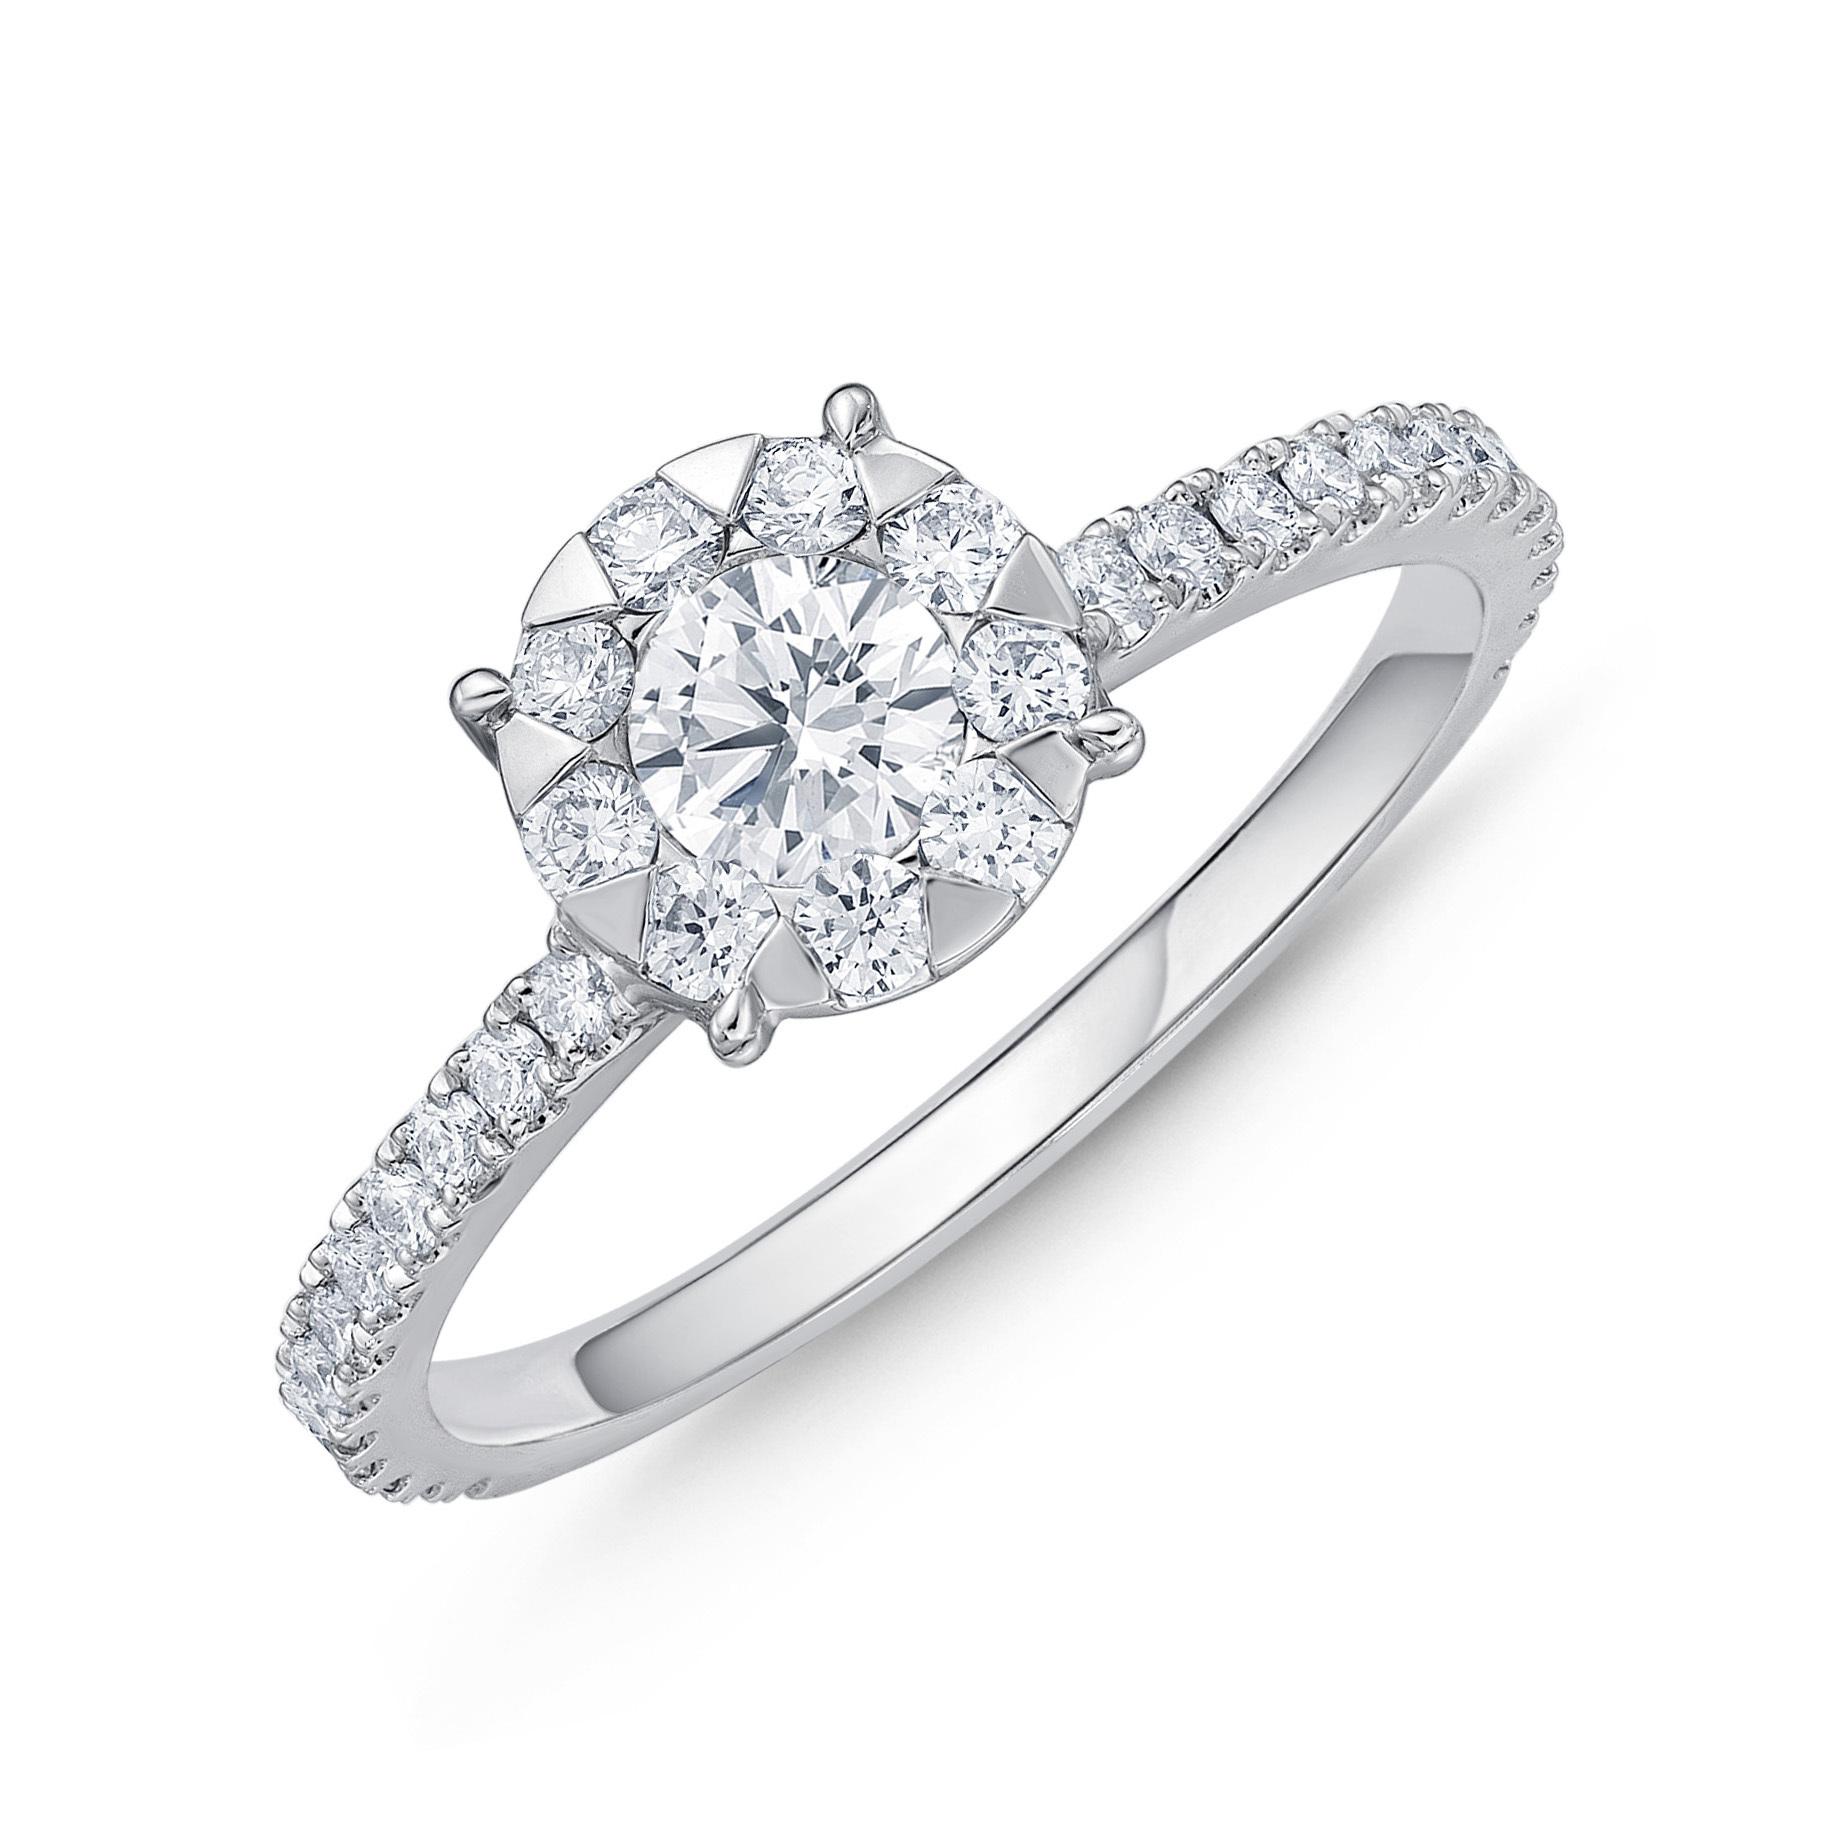 Memoire 18ct White Gold 0.70 Carat Diamond Bouquet Halo Solitaire Ring